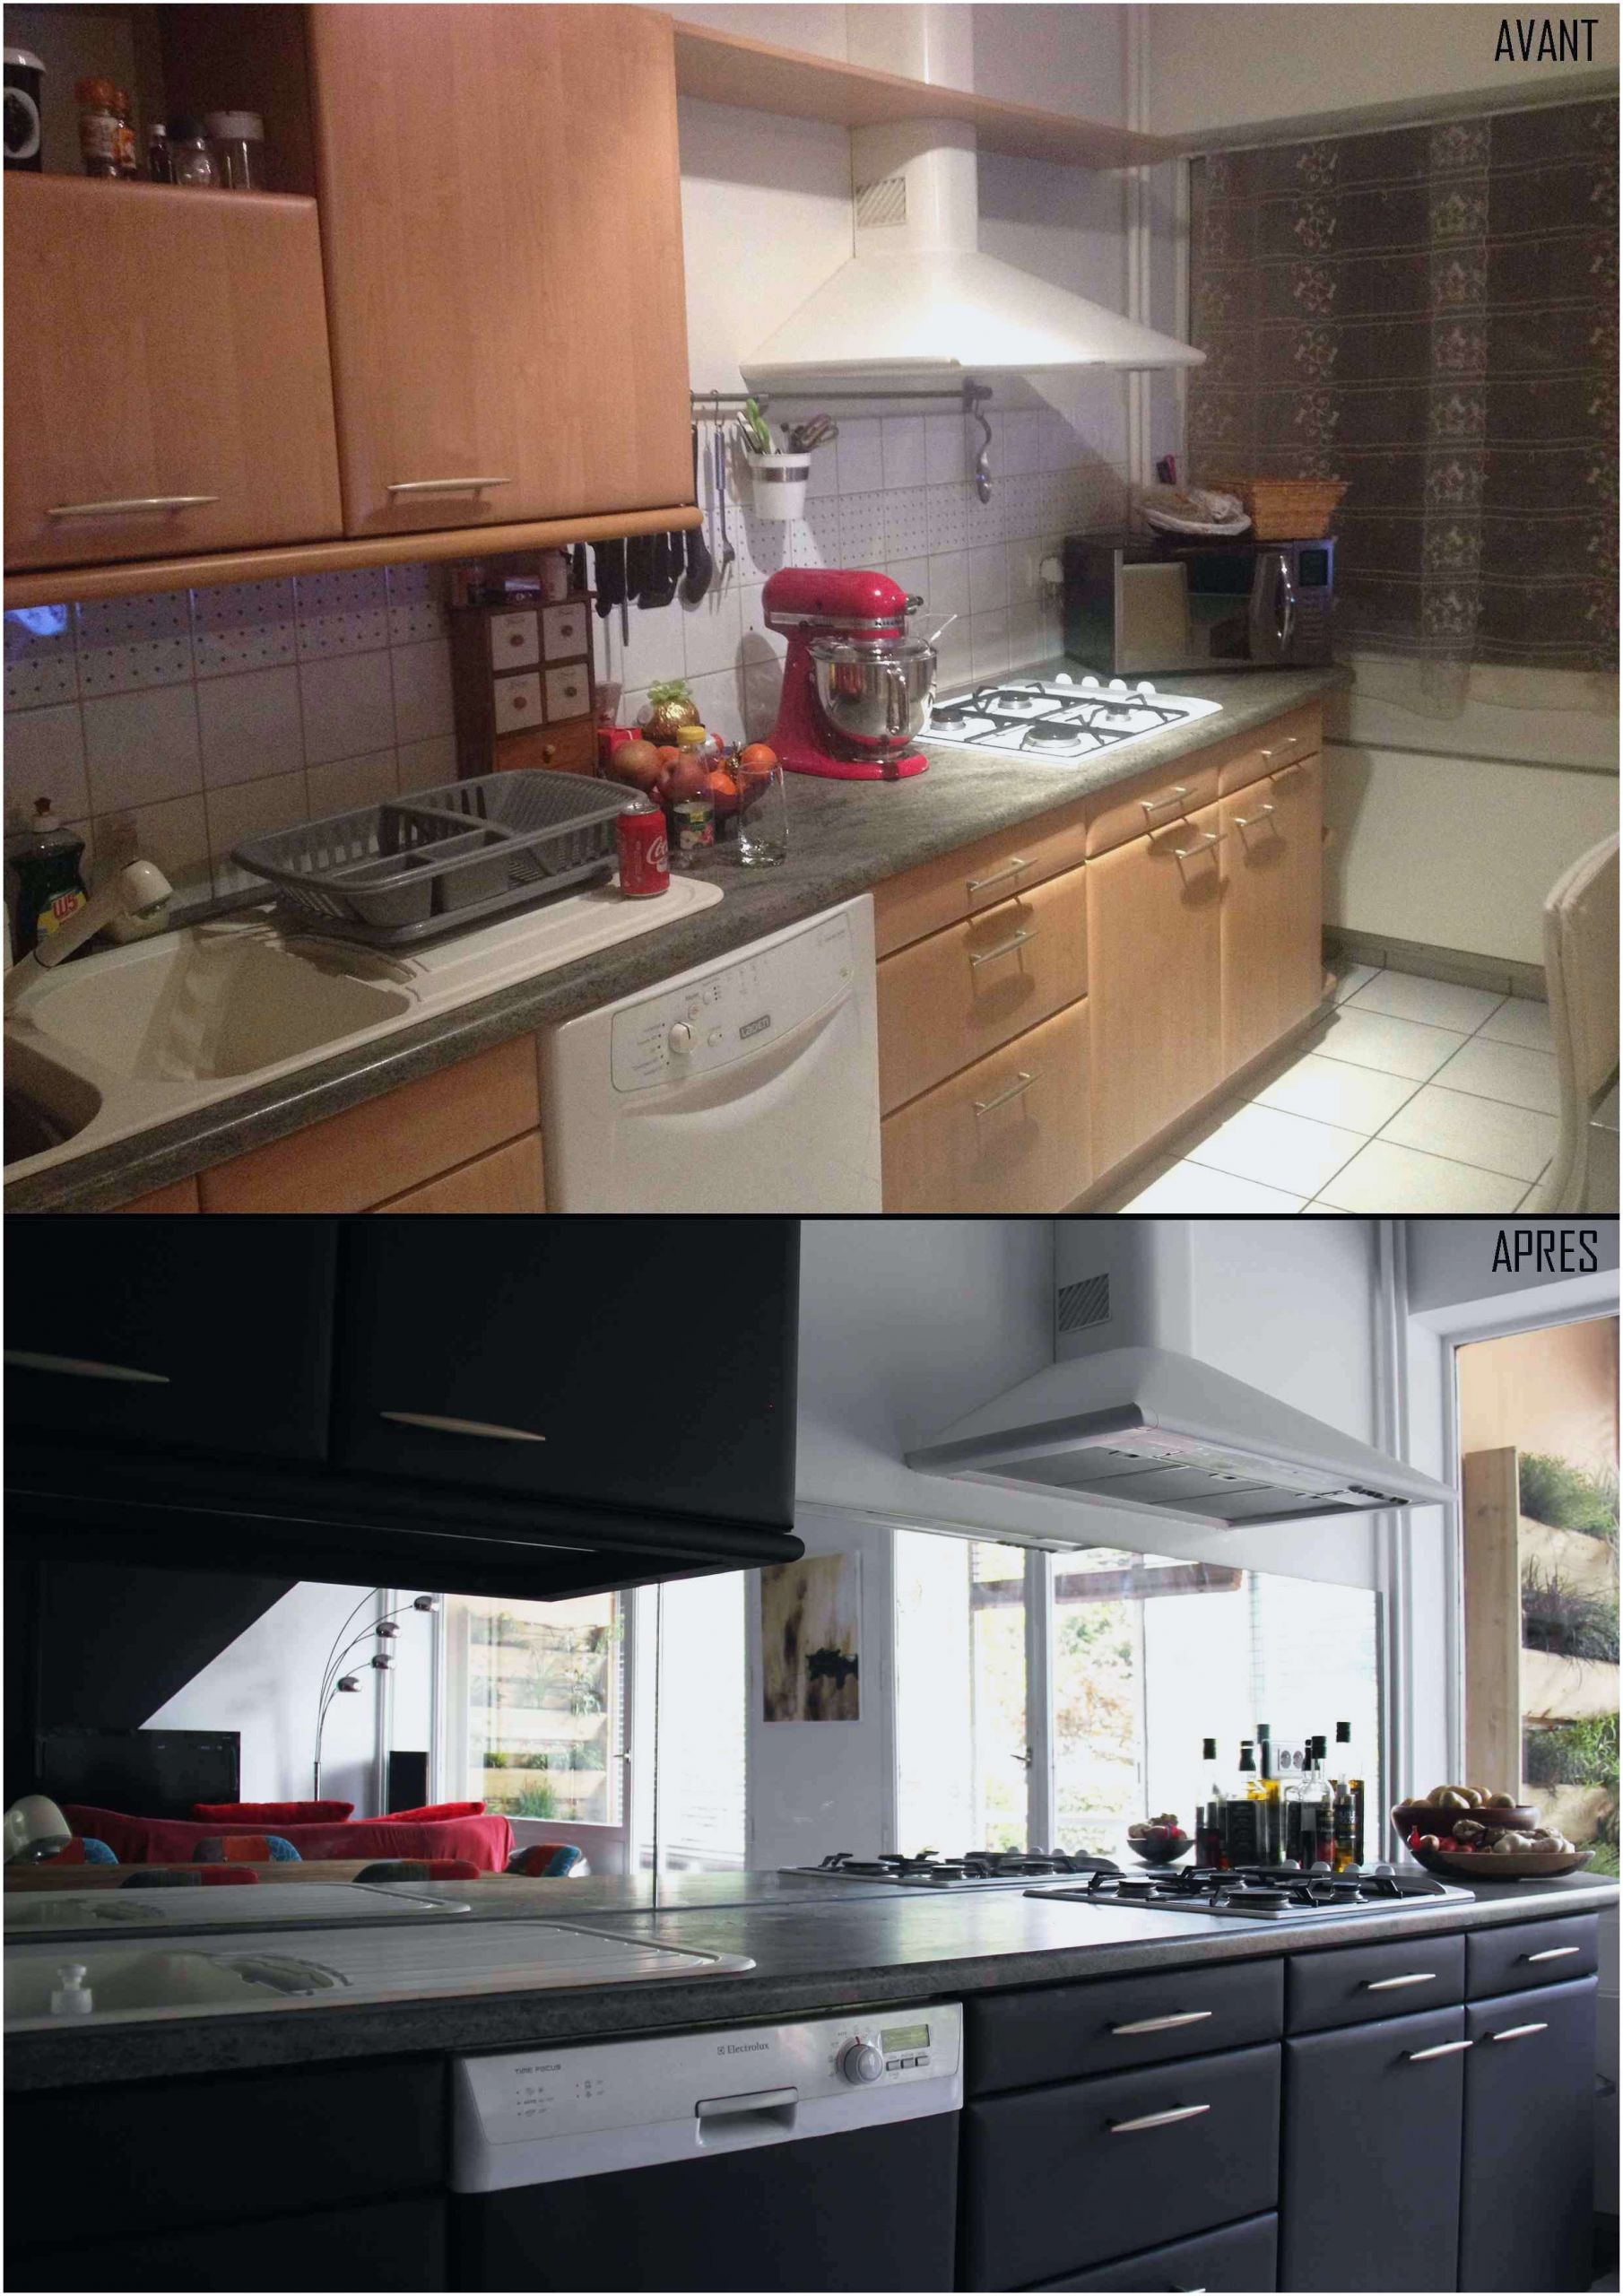 meuble d angle cuisine castorama luxe meuble haut cuisine castorama inspirant s mobilier cuisine 0d of meuble d angle cuisine castorama